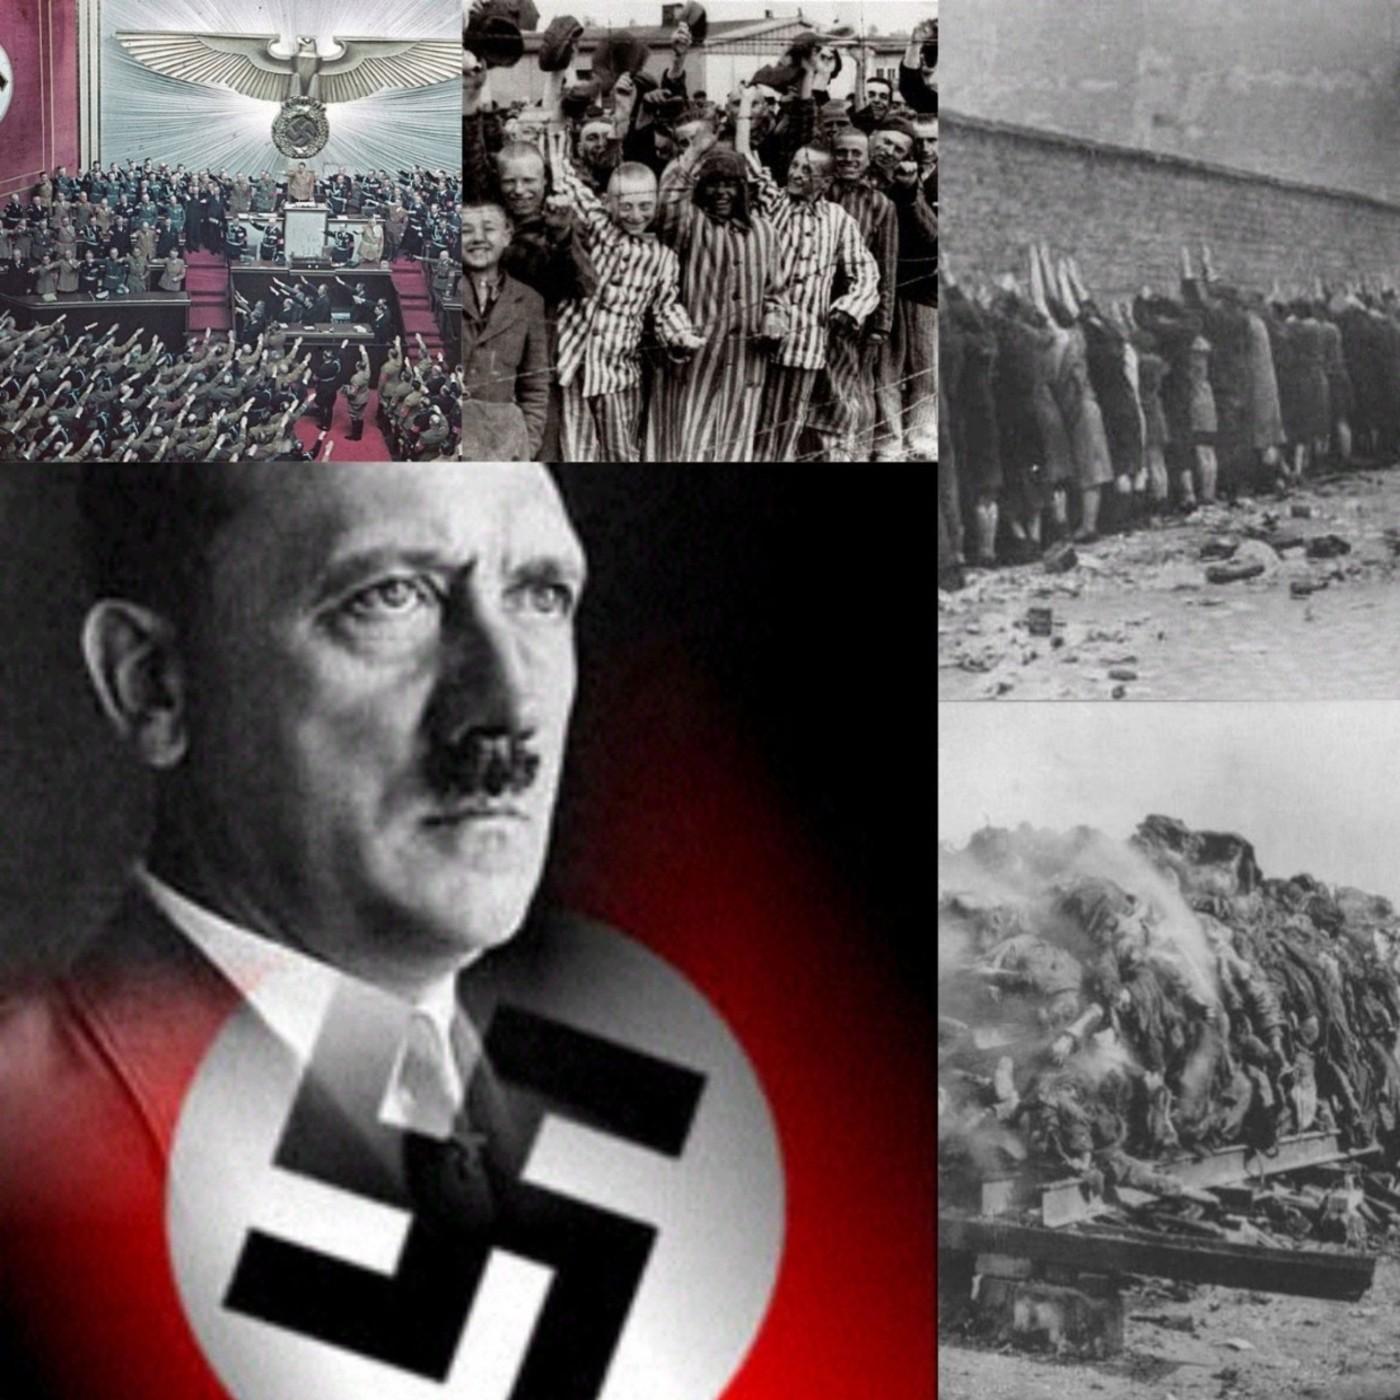 Crónicas de la segunda guerra mundial: 15- El régimen nazi